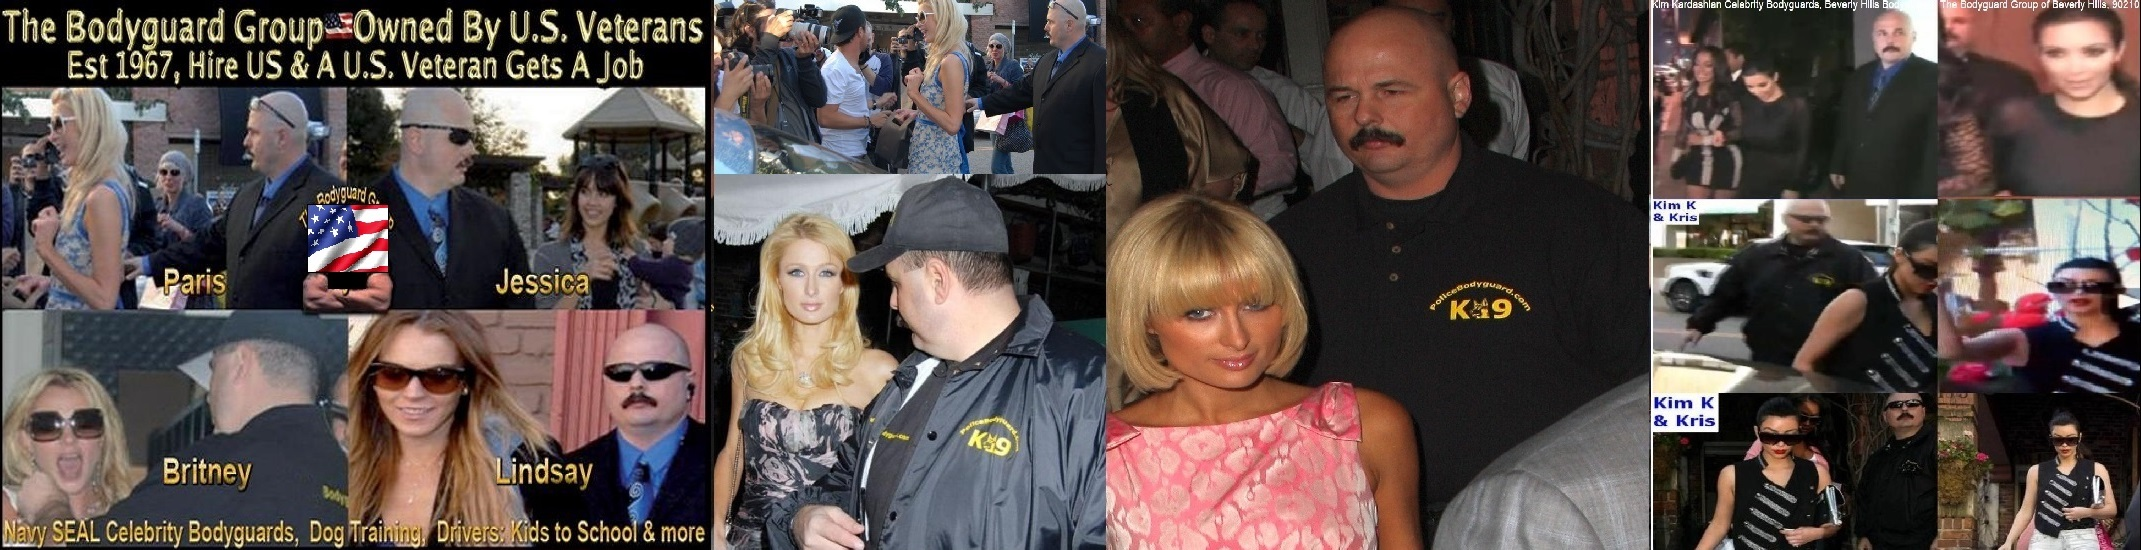 Kim Kardashian Paris Hilton Celebrity Bodyguards for hire Kris Herzog of The Bodyguard Group of Beverly Hills 90210